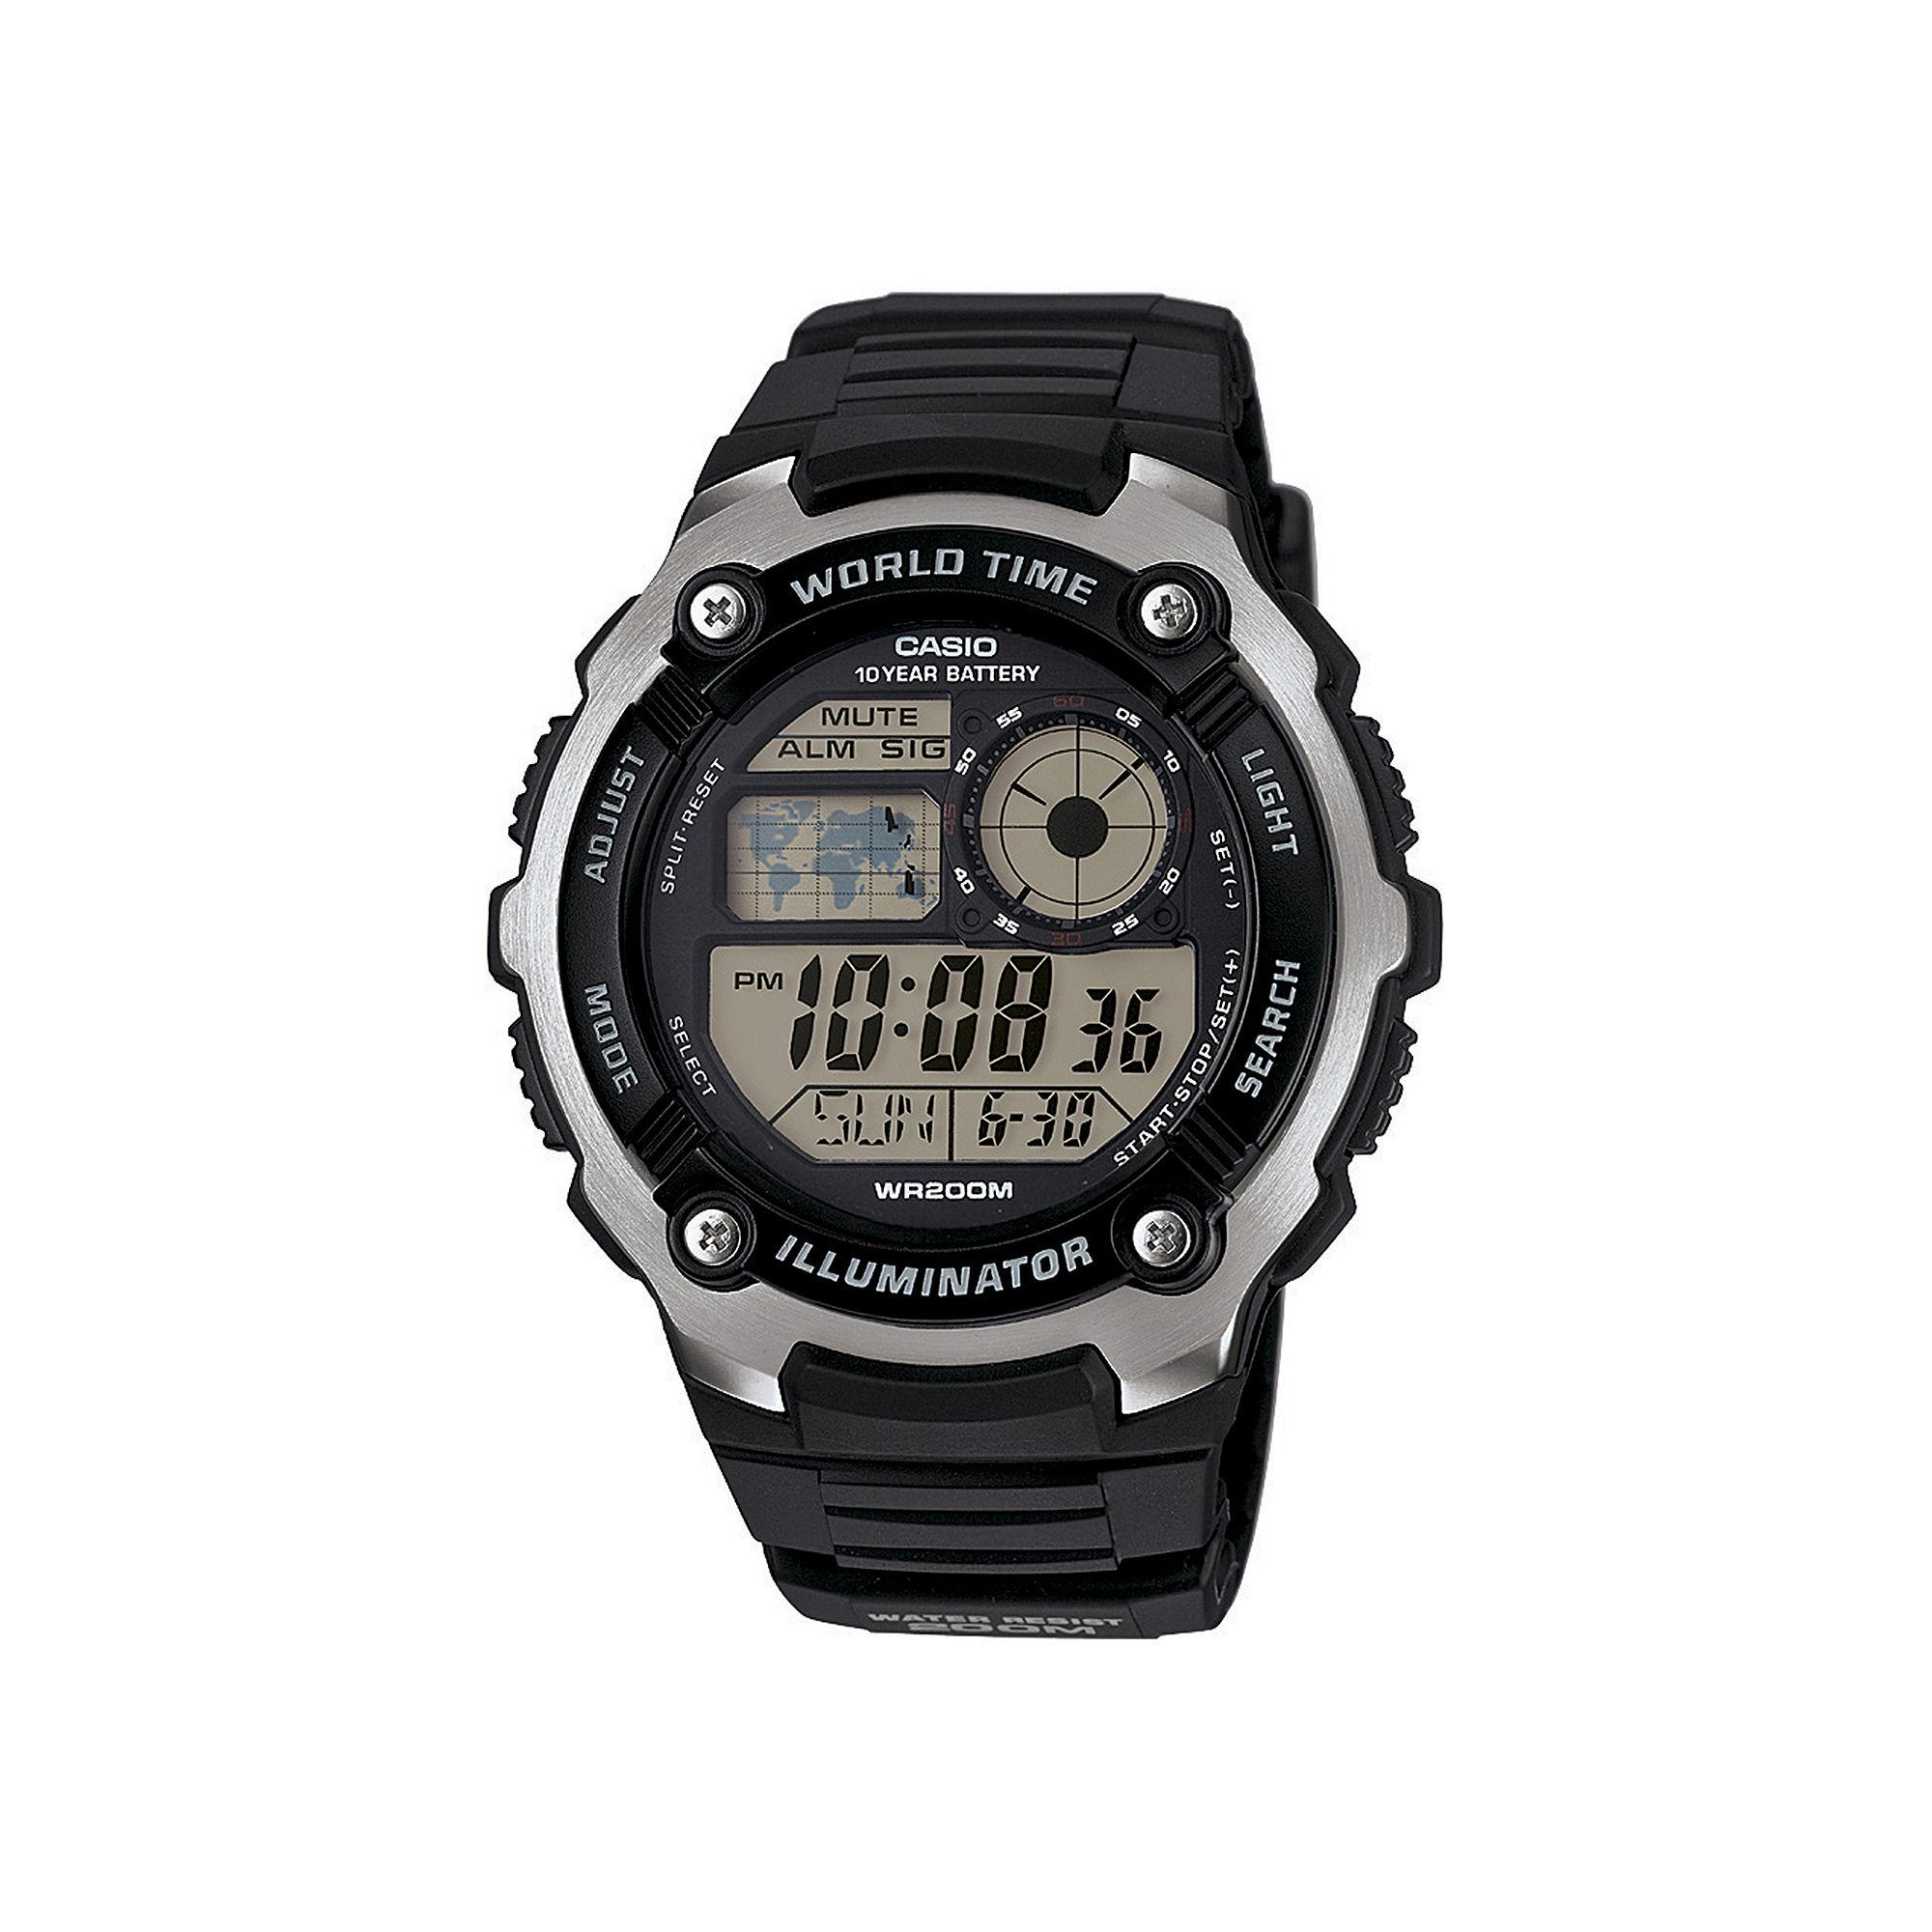 Casio Illuminator Mens Sport Watch AE2100W-1AV